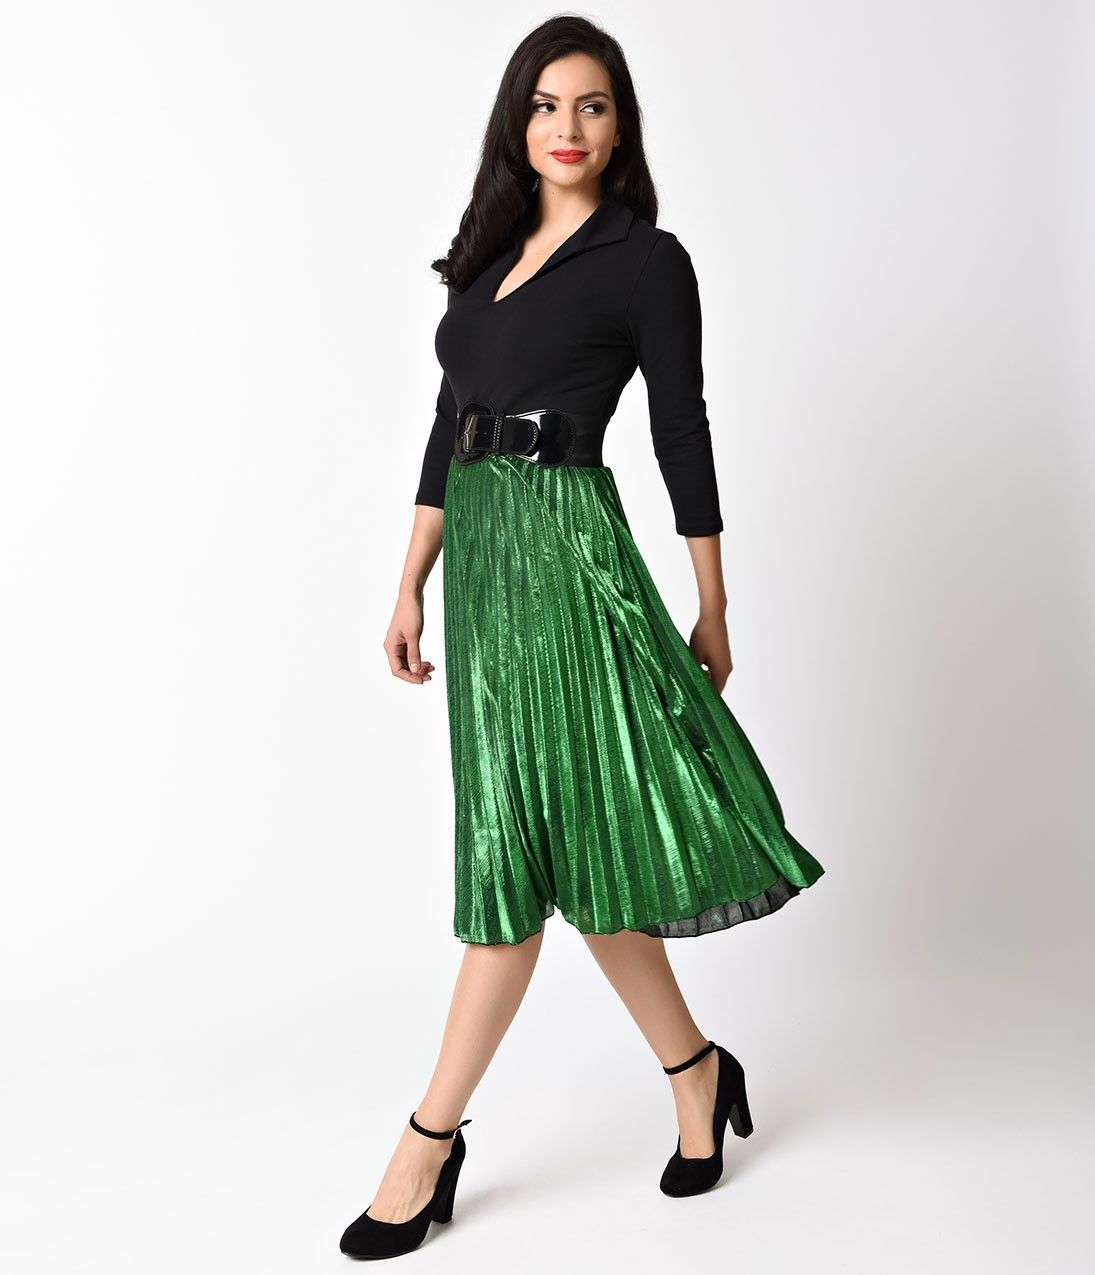 Retro Style Green Metallic Pleated Midi Skirt